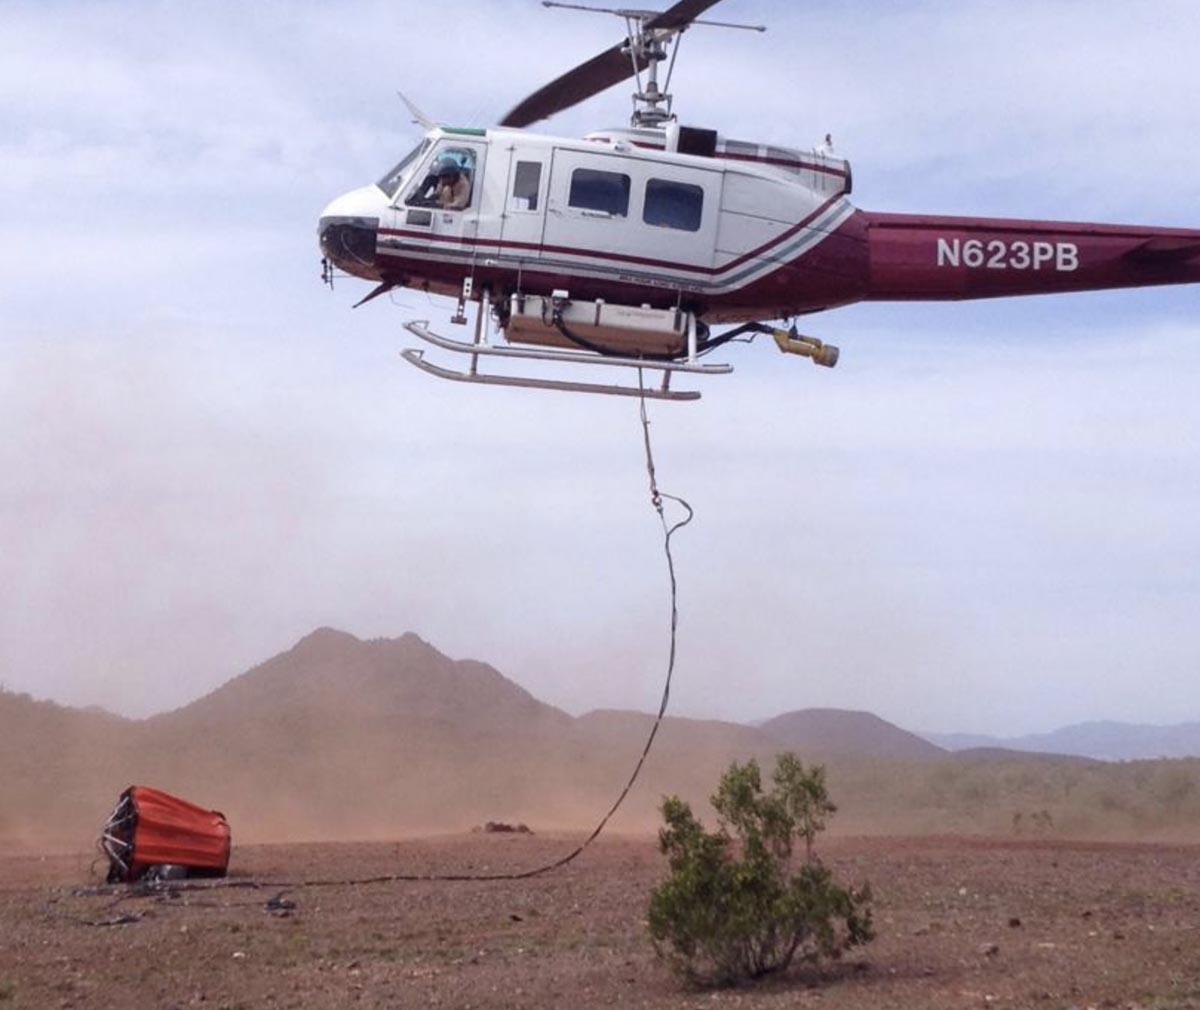 UH-1H N623PB